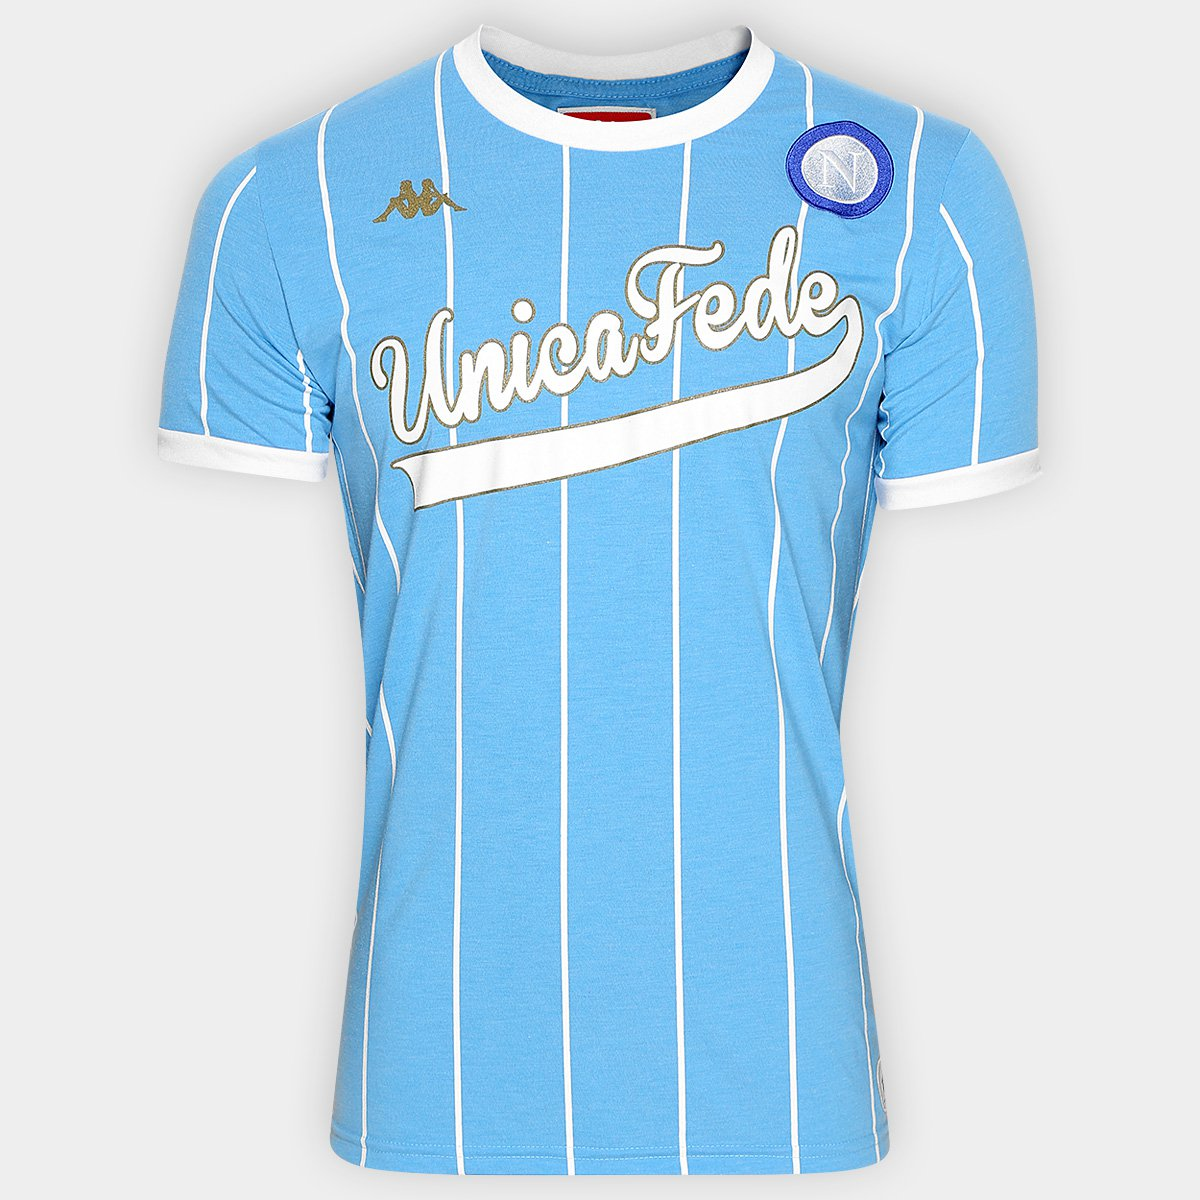 Camiseta Kappa Napoli Supporter I Sublimada - Compre Agora  d683730383eb9